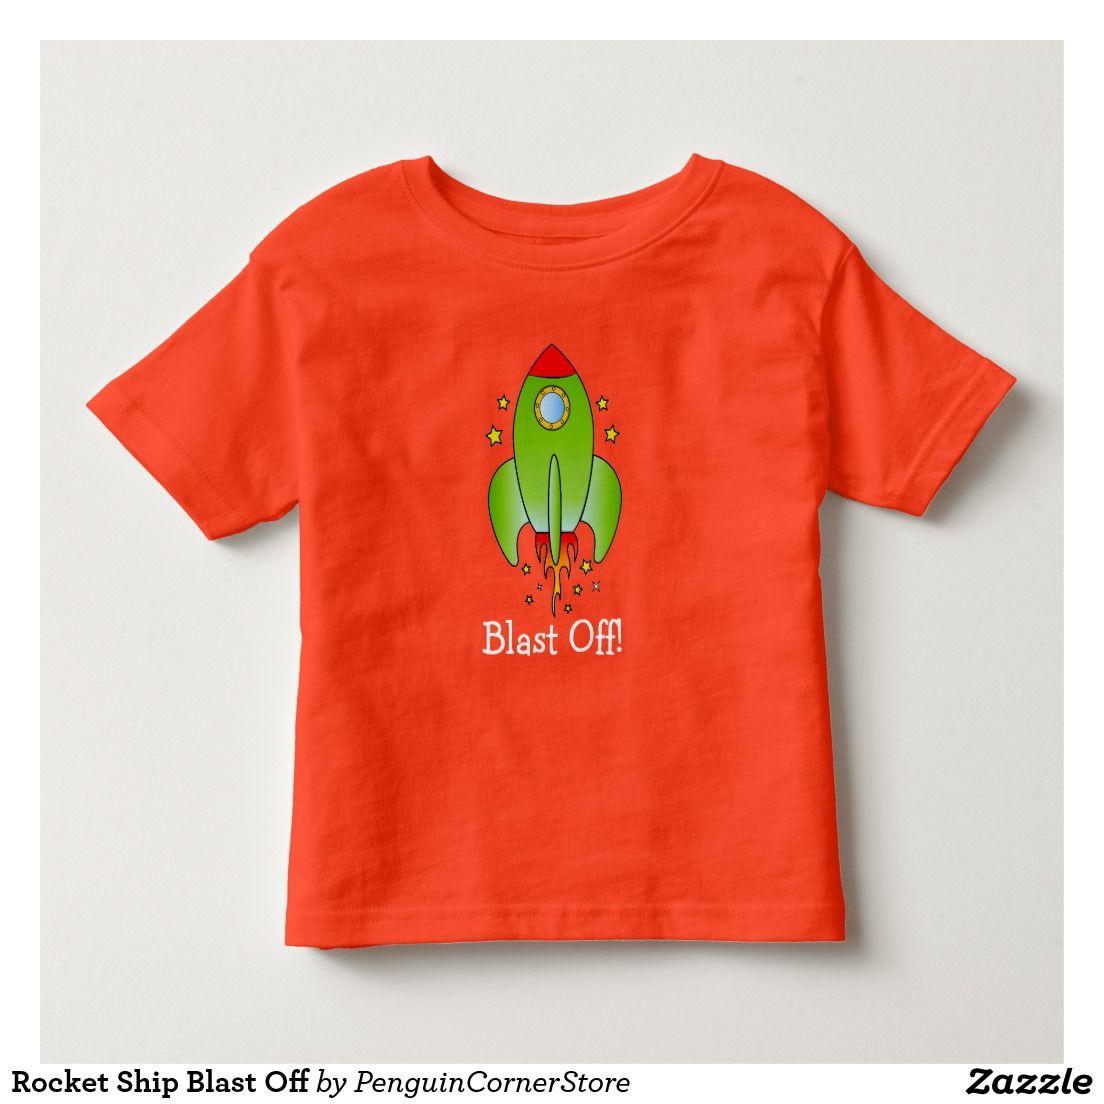 Rocket Ship Blast Off Toddler T-shirt